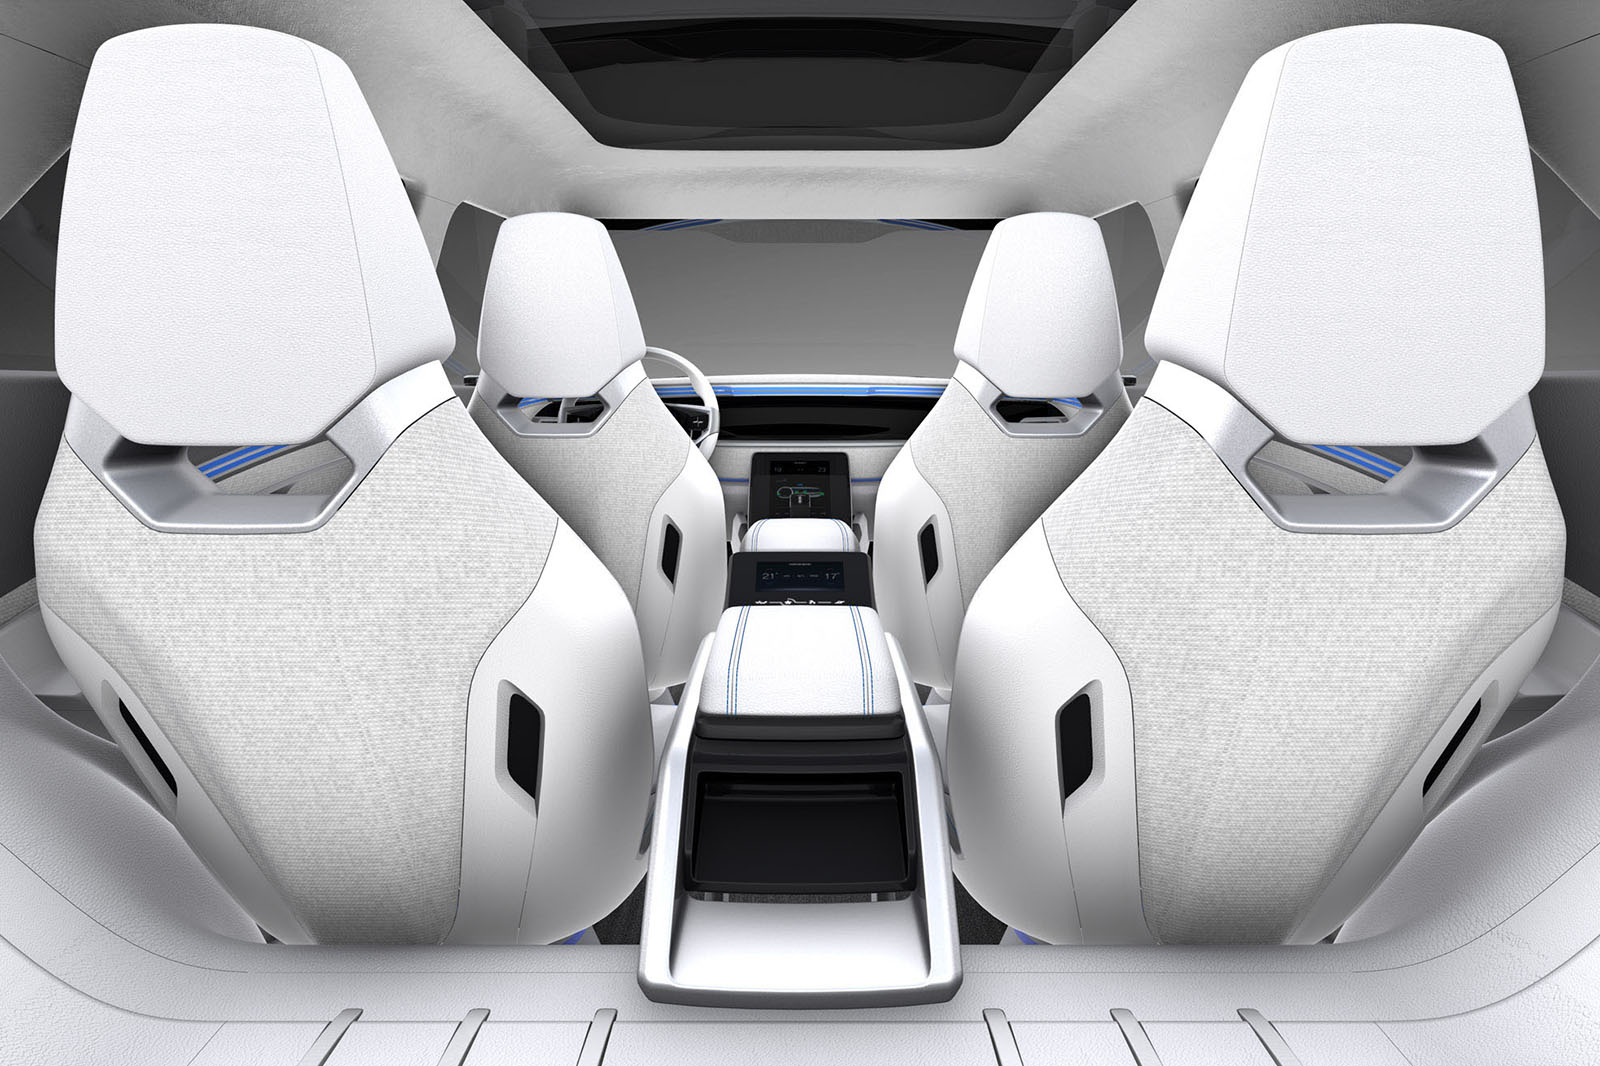 Ssangyong e-SIV concept previews EV | Autocar